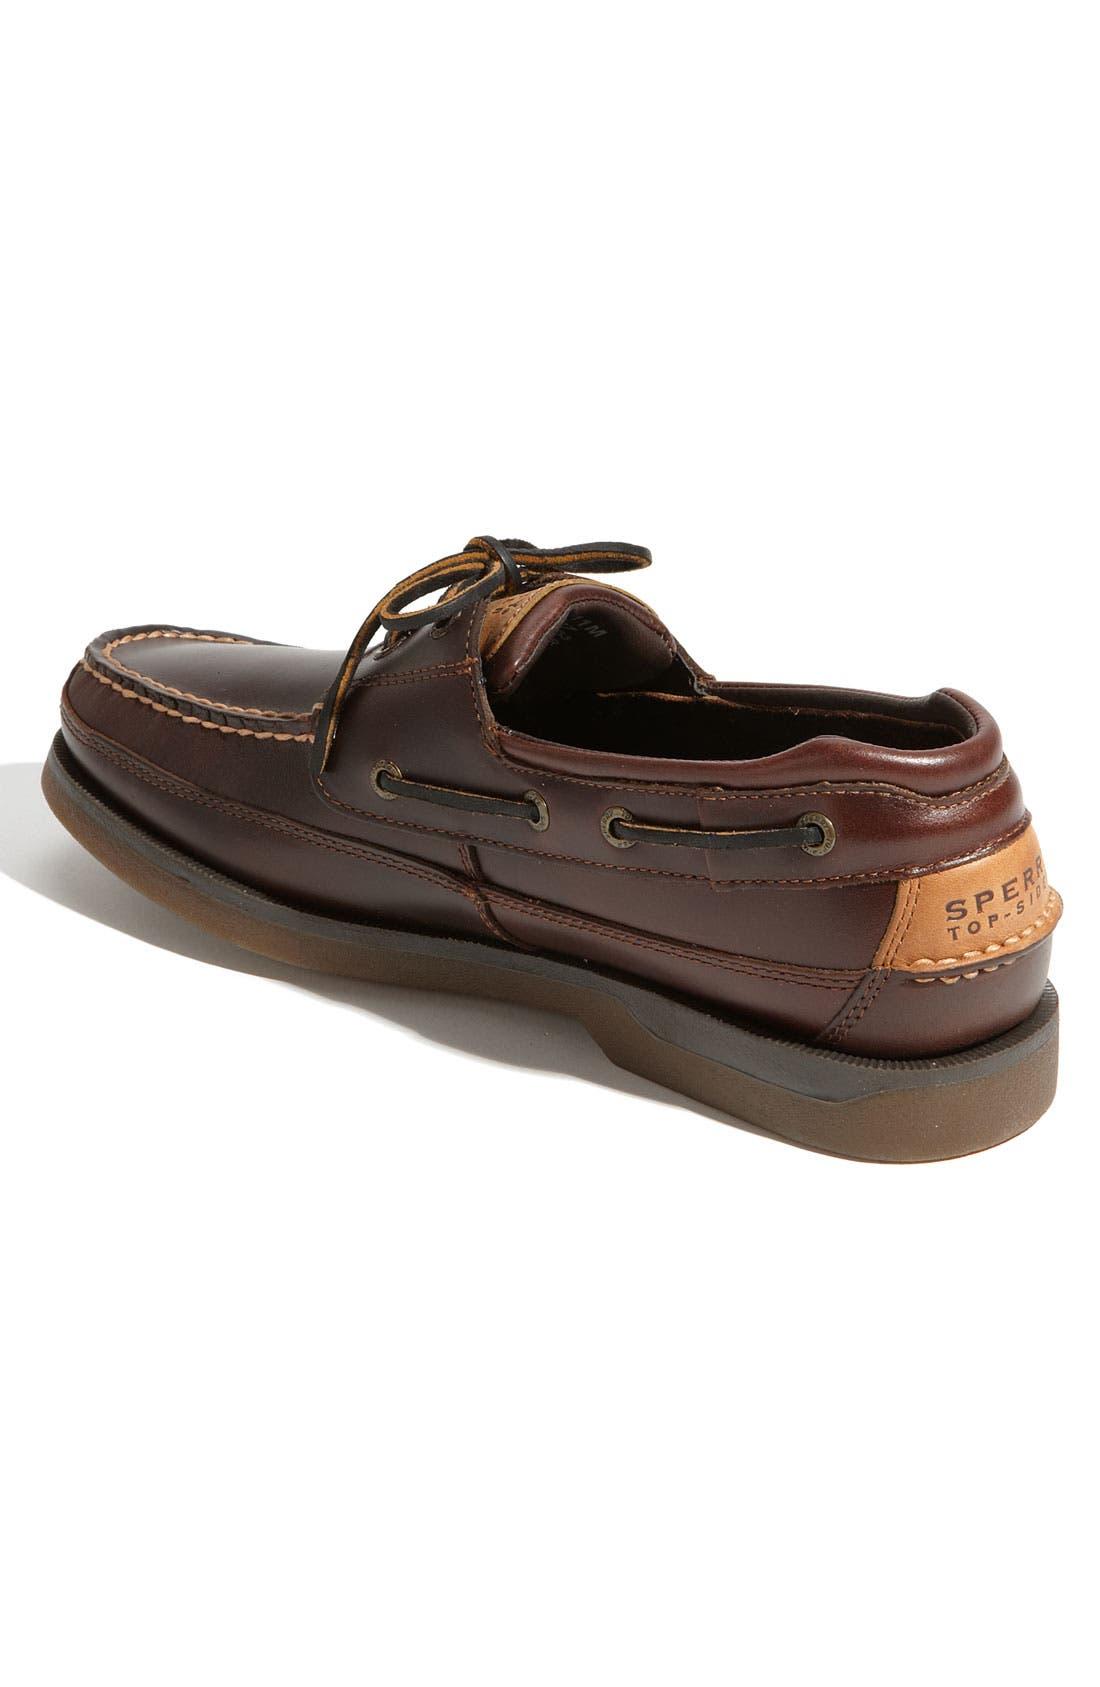 Top-Sider<sup>®</sup> 'Mako Two-Eye Canoe Moc' Boat Shoe,                             Alternate thumbnail 3, color,                             Dark Brown